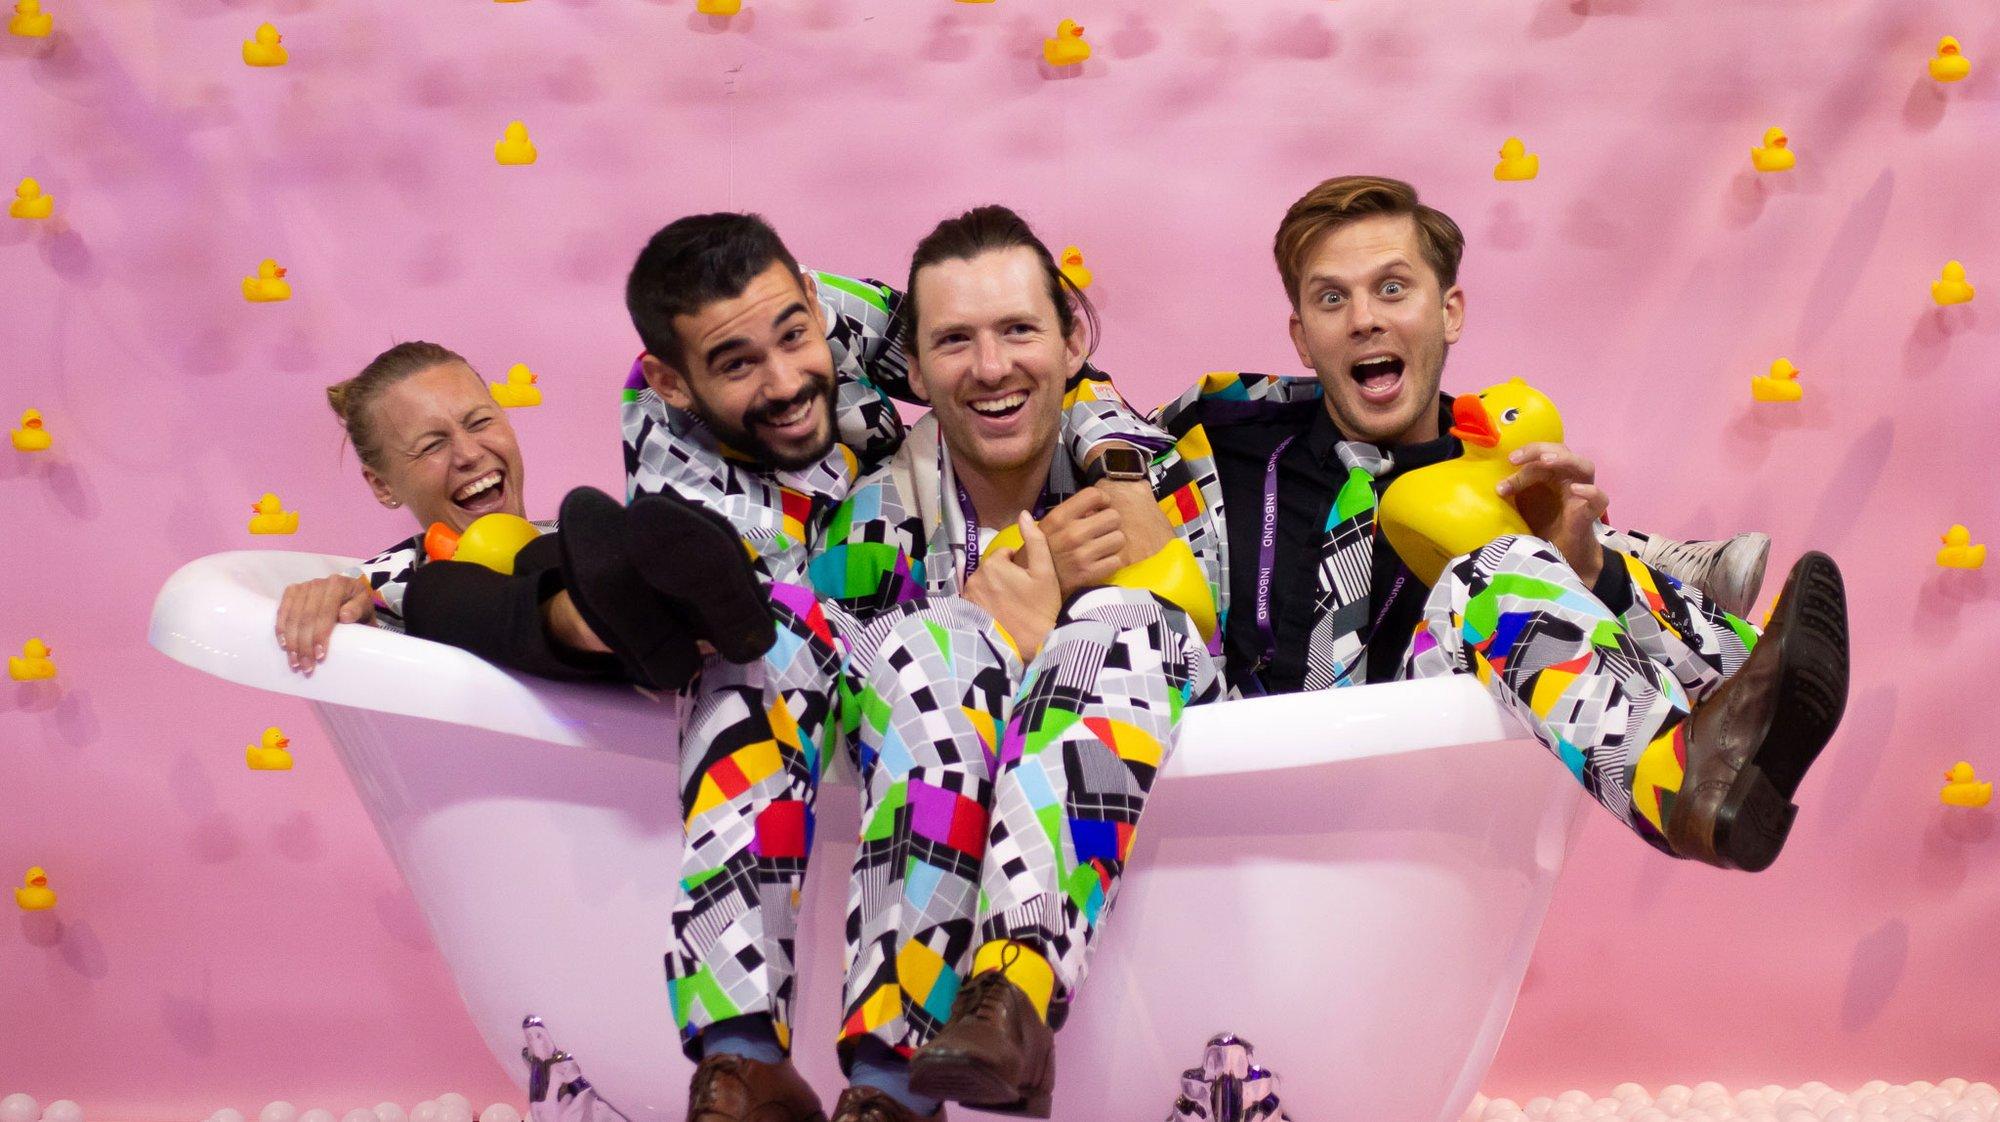 Happy GetAccepters in a bathtub at Inbound18